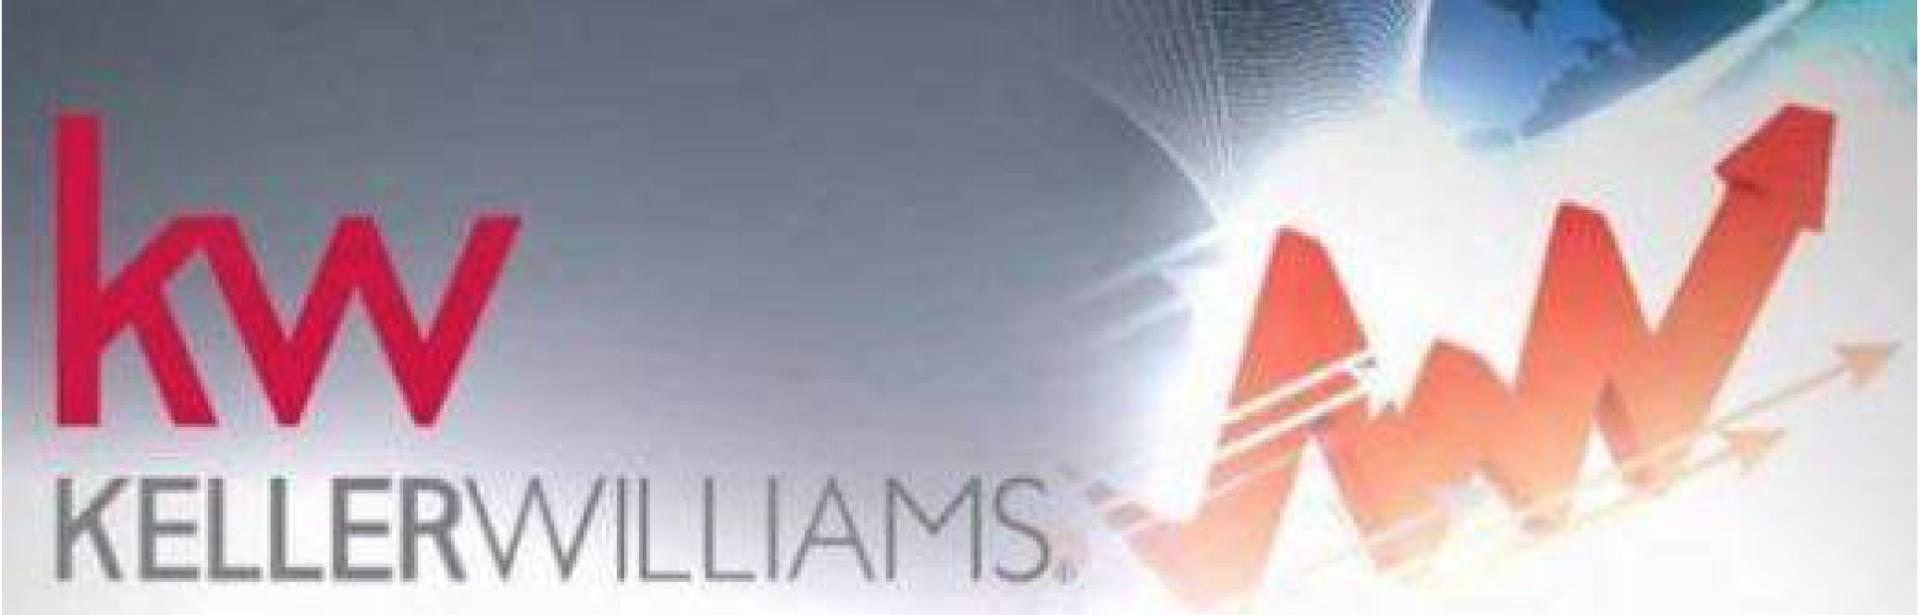 Keller Williams Dominates Atlanta Real Estate